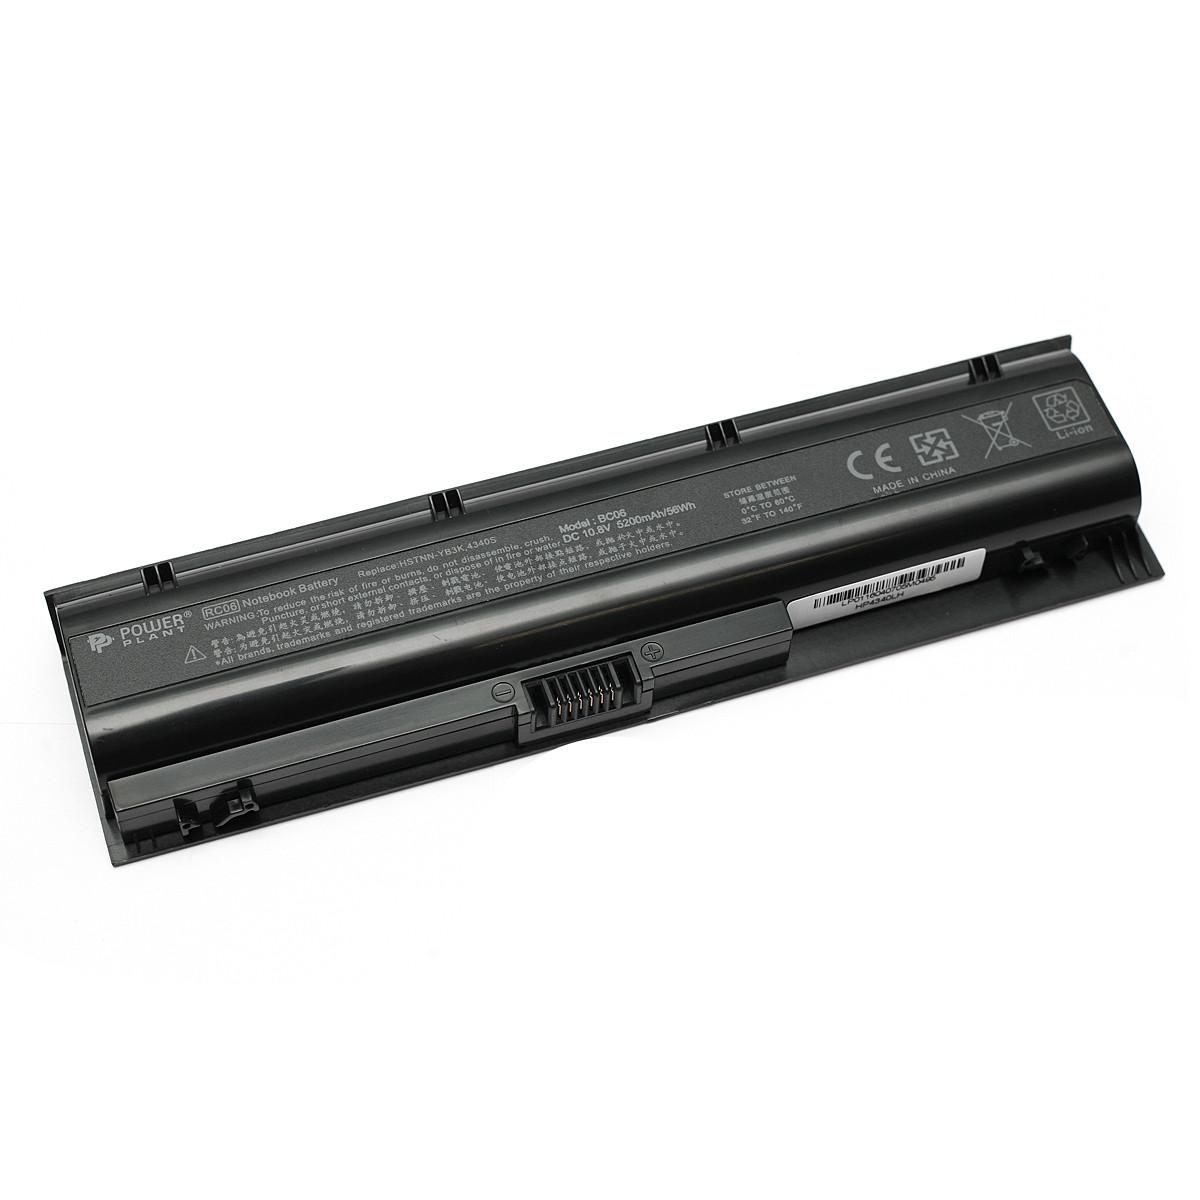 Аккумулятор PowerPlant для ноутбуков HP ProBook 4340s (HSTNN-YB3K, HP4340LH) 10.8V 5200mAh